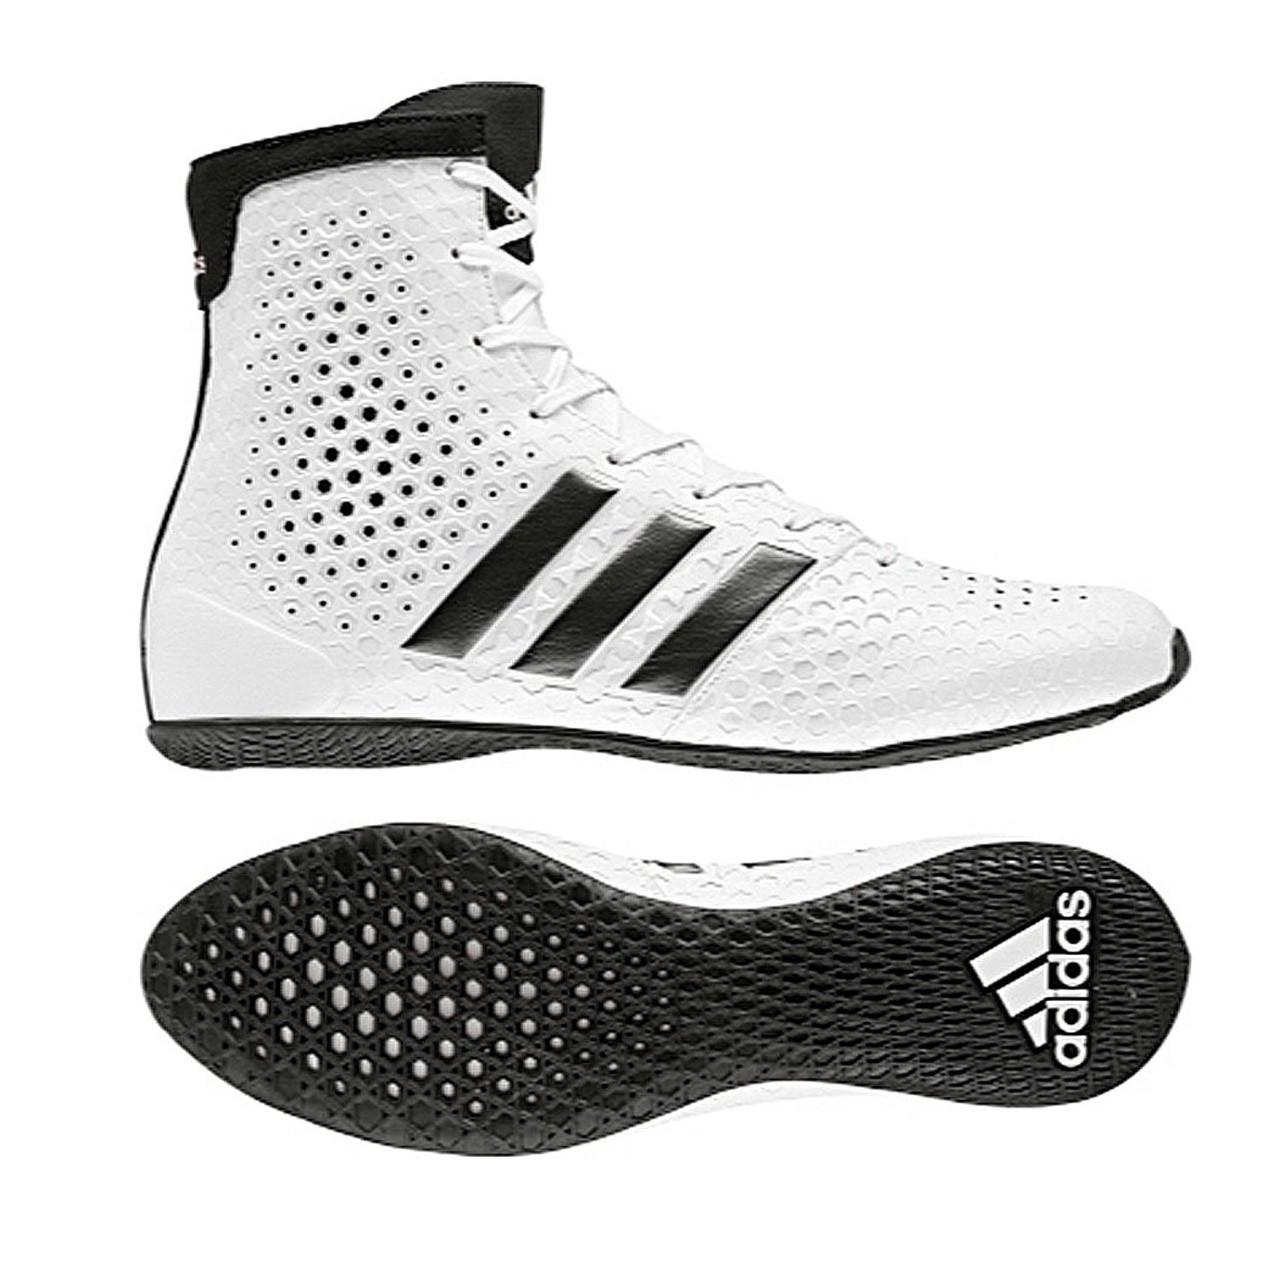 check out eabb8 83ebe Adidas KO Legend 16.1 White Boxing Boots - Martial Art Shop